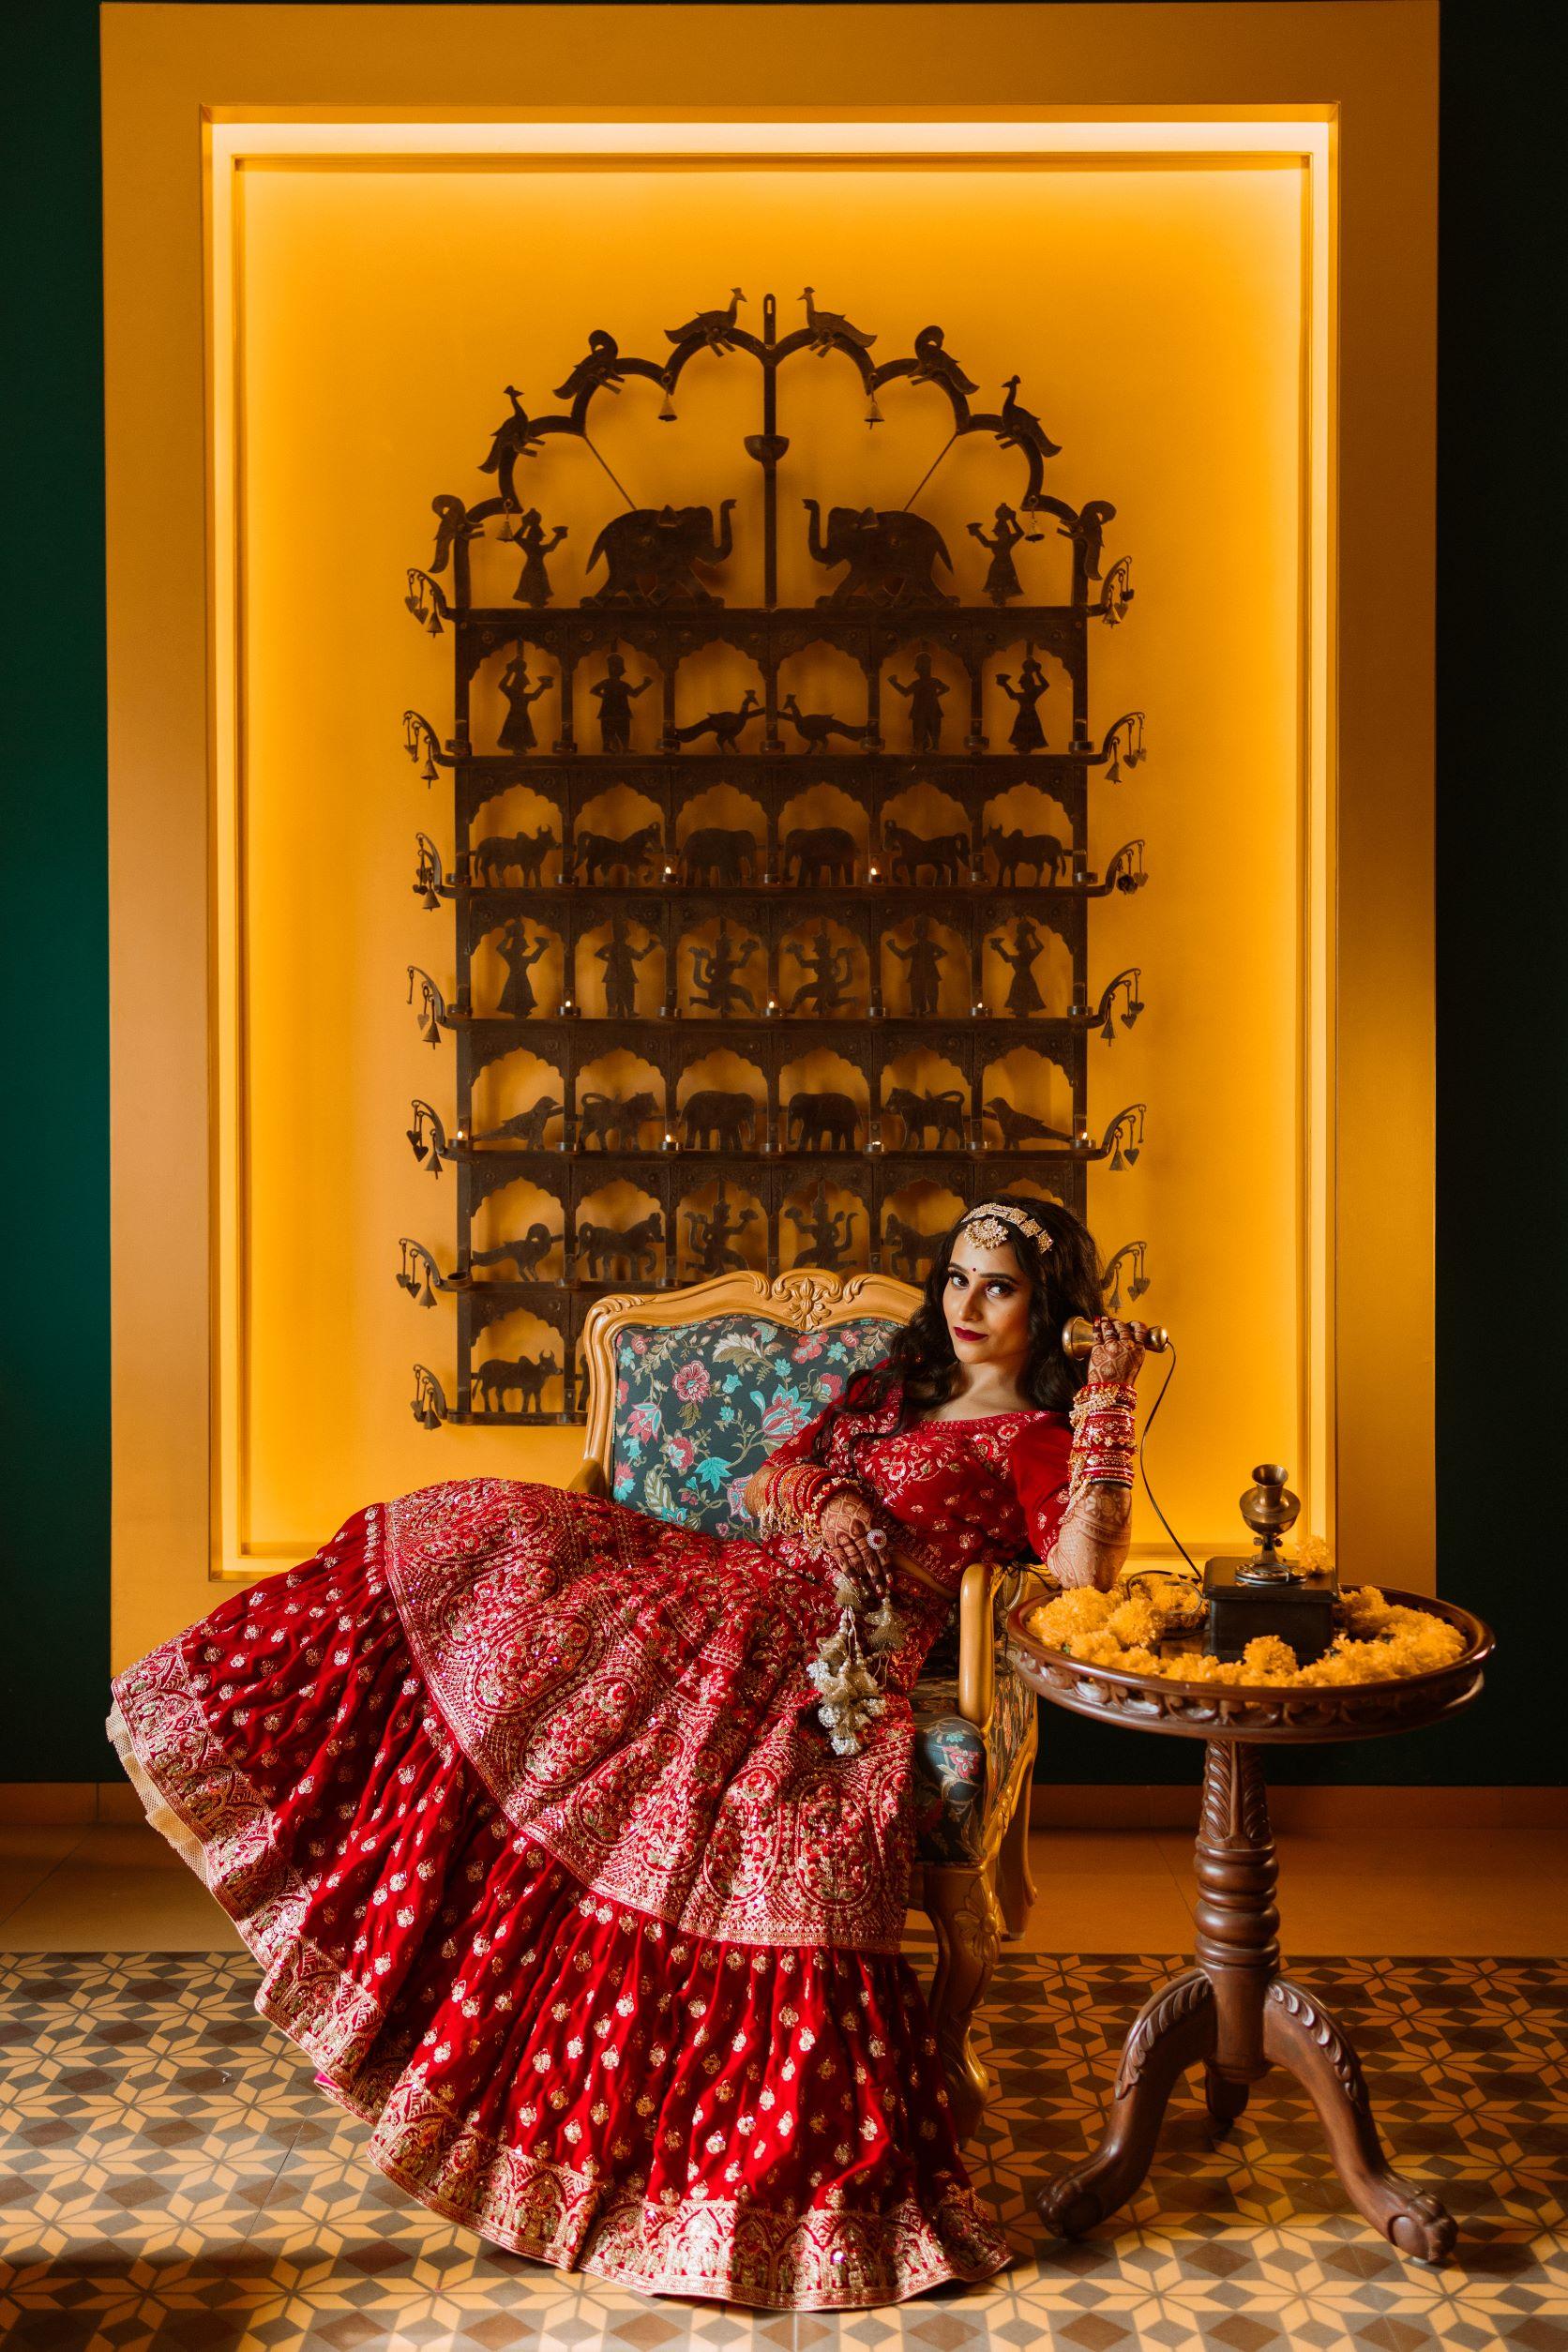 bride in red bridal lehenga poses with vintage phone